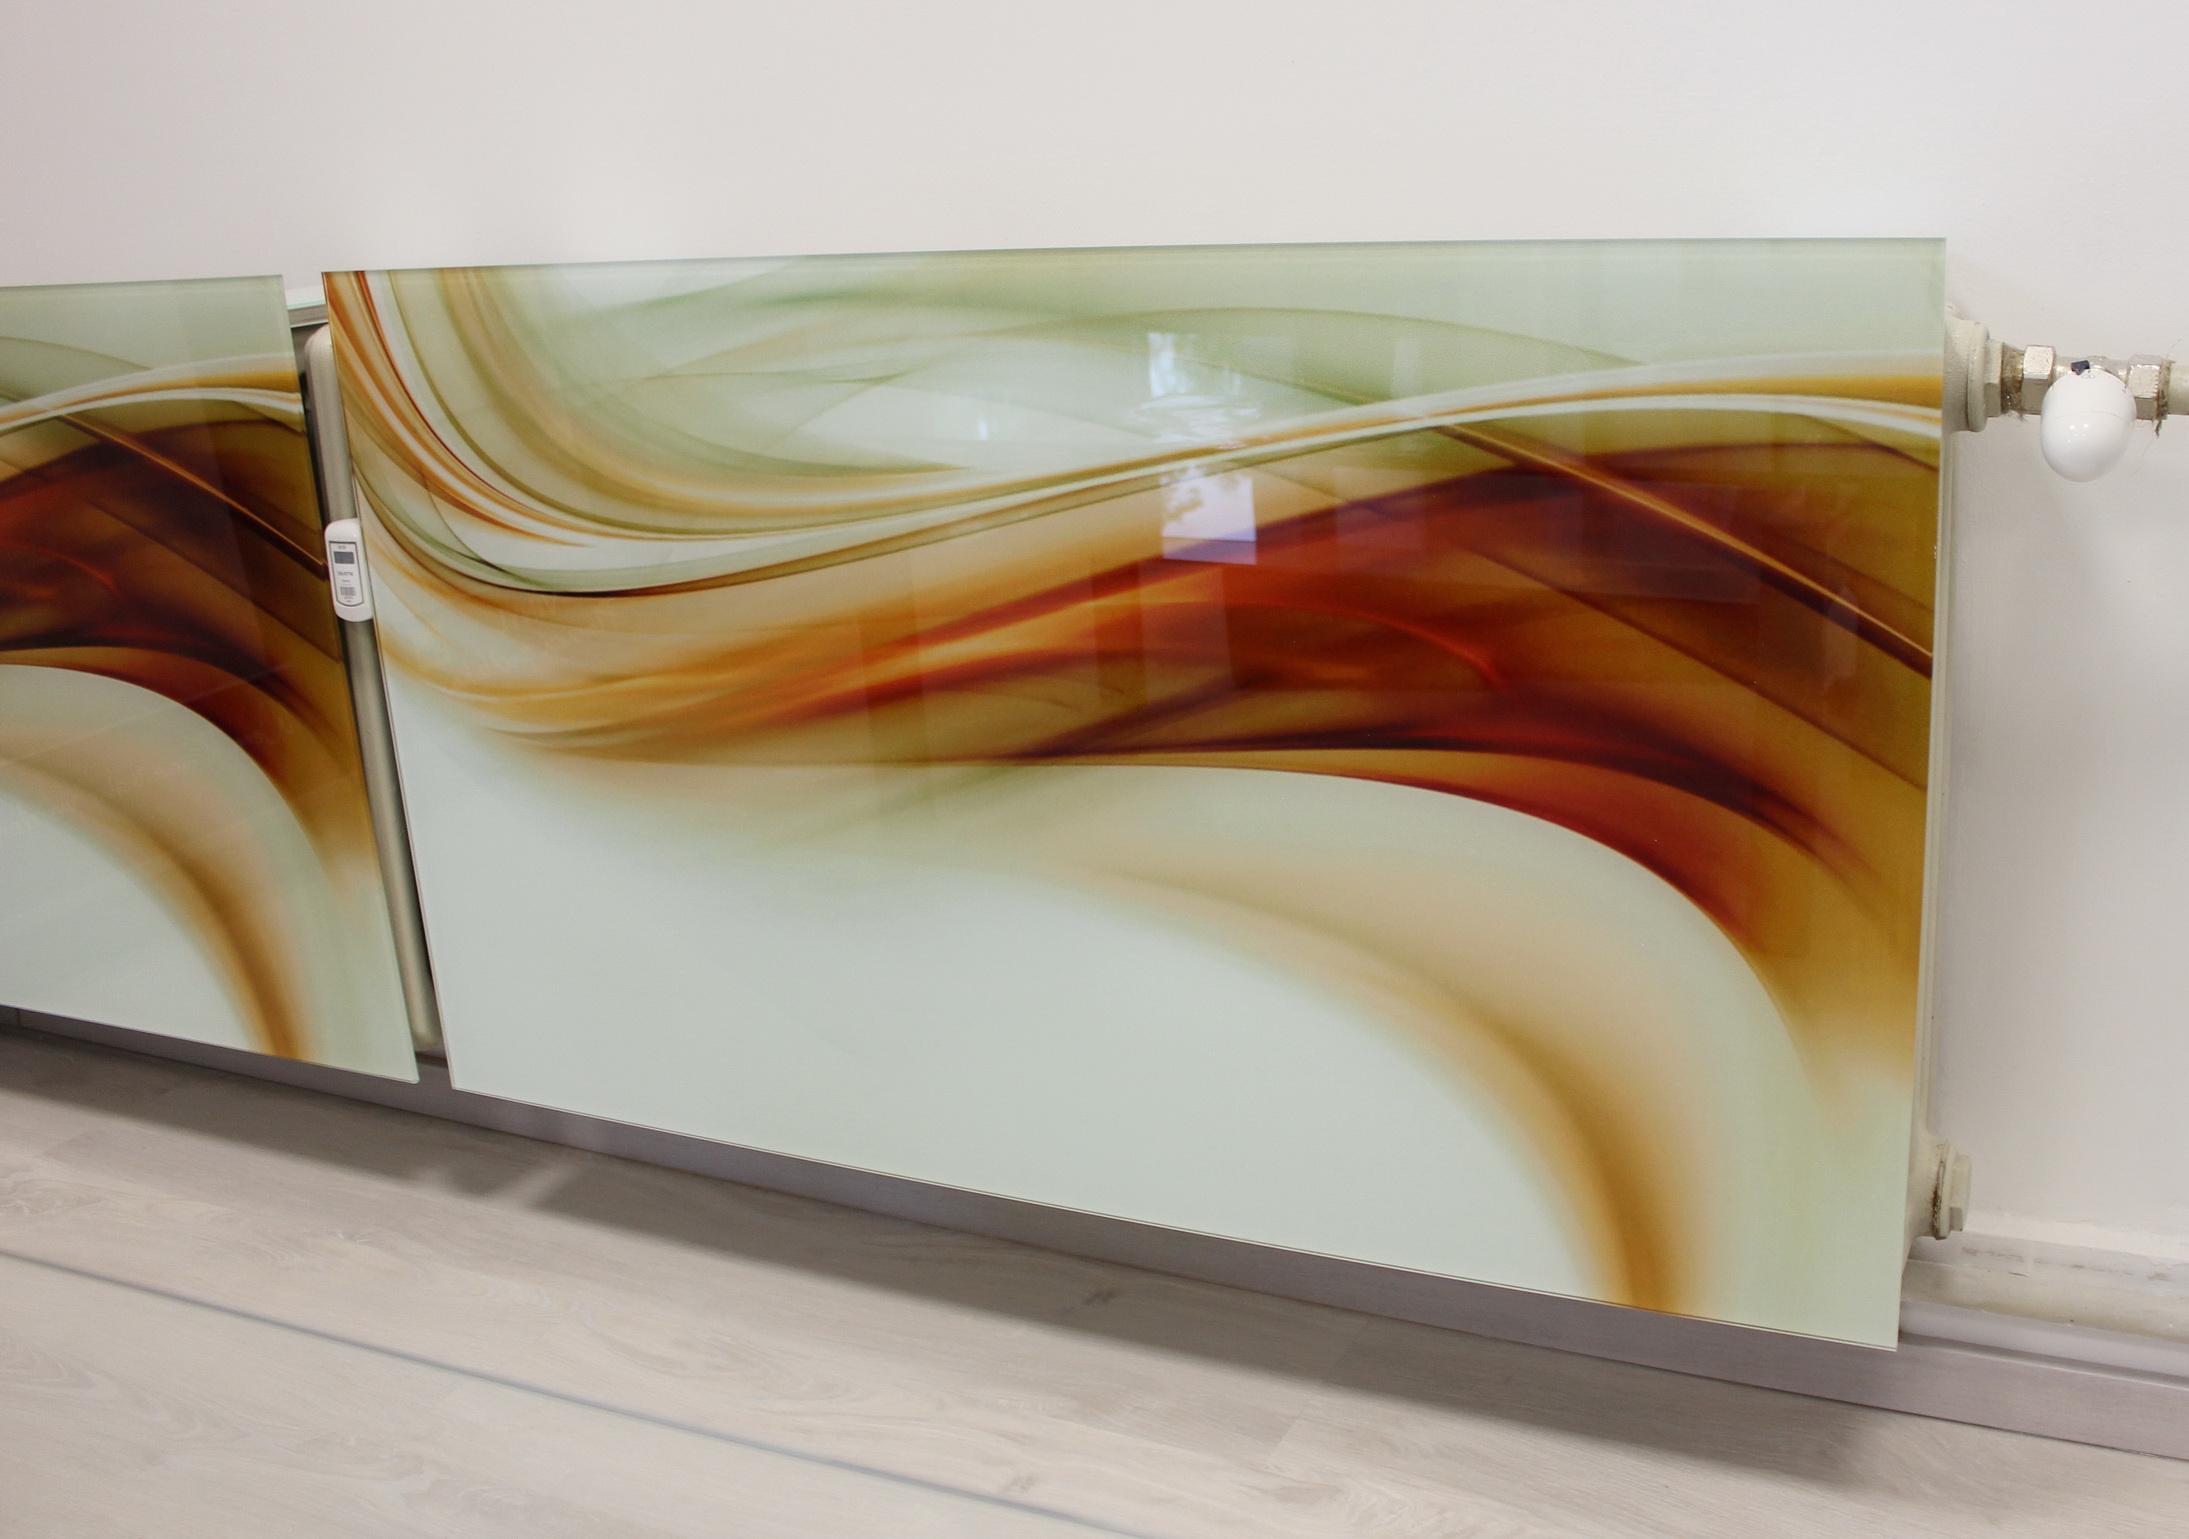 sklenený radiátorový kryt 1